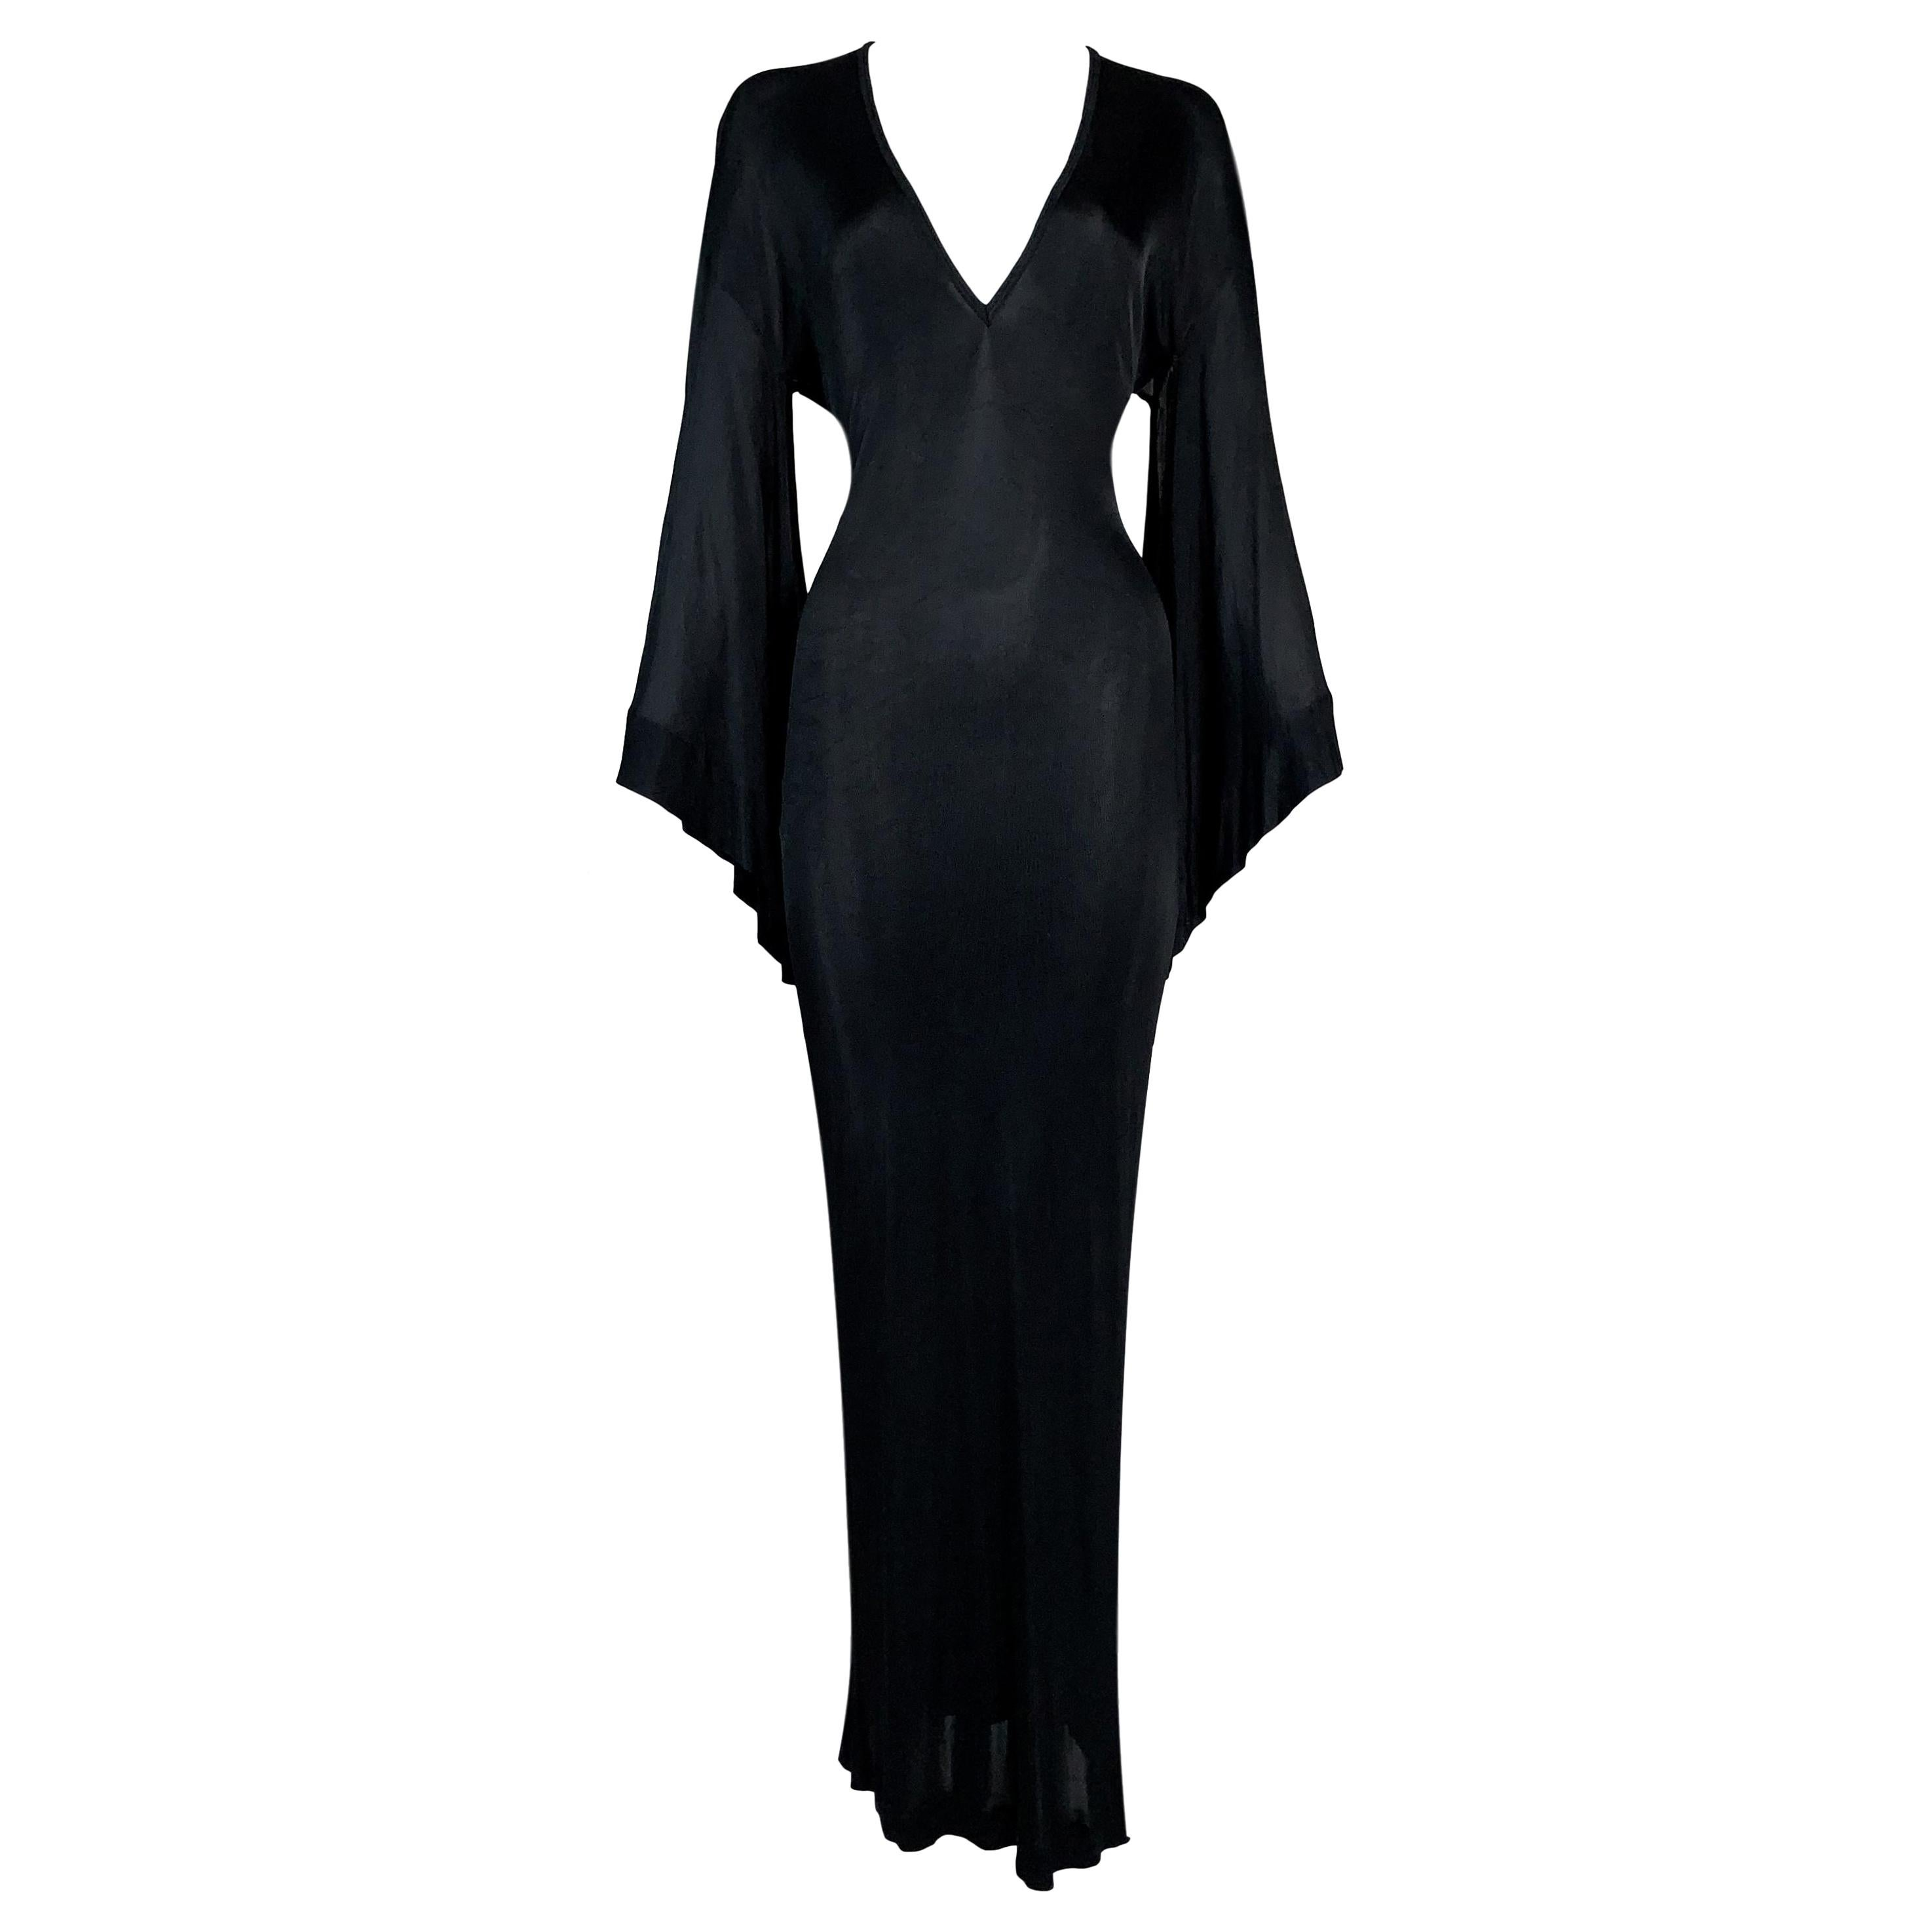 1990's Jean Paul Gaultier Elvira Slinky Kimono Plunging Black Long Dress